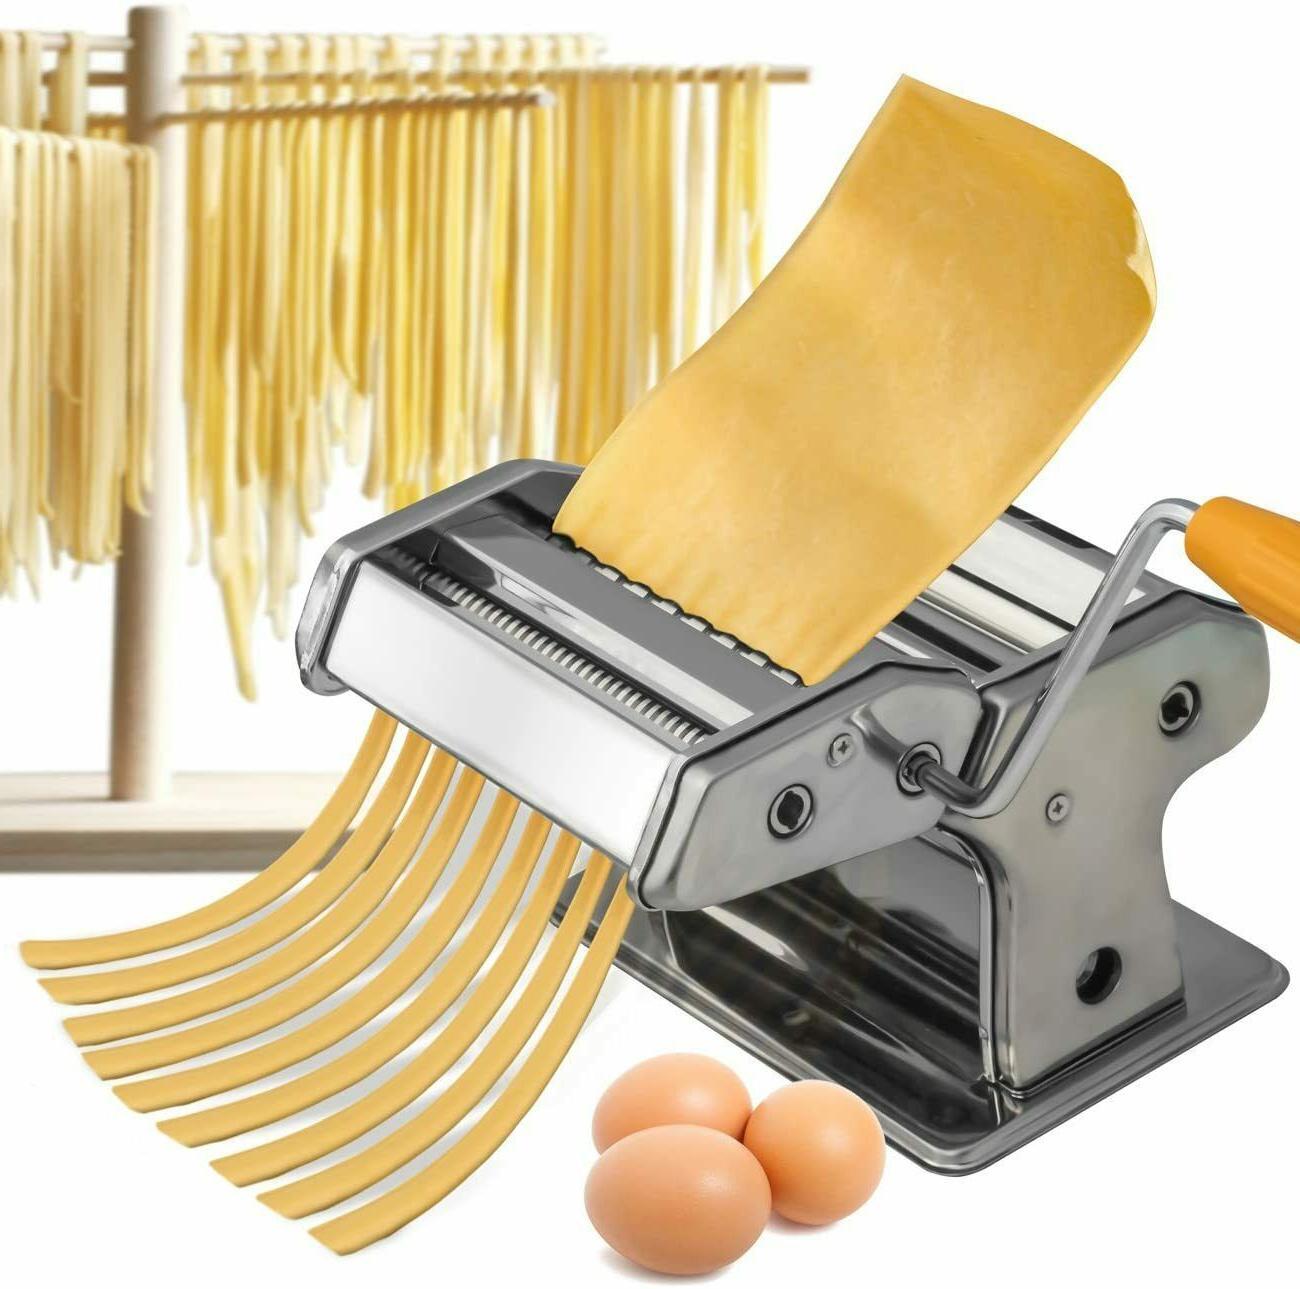 OxGord Haven Stainless Steel Pasta Maker Machine - Fresh